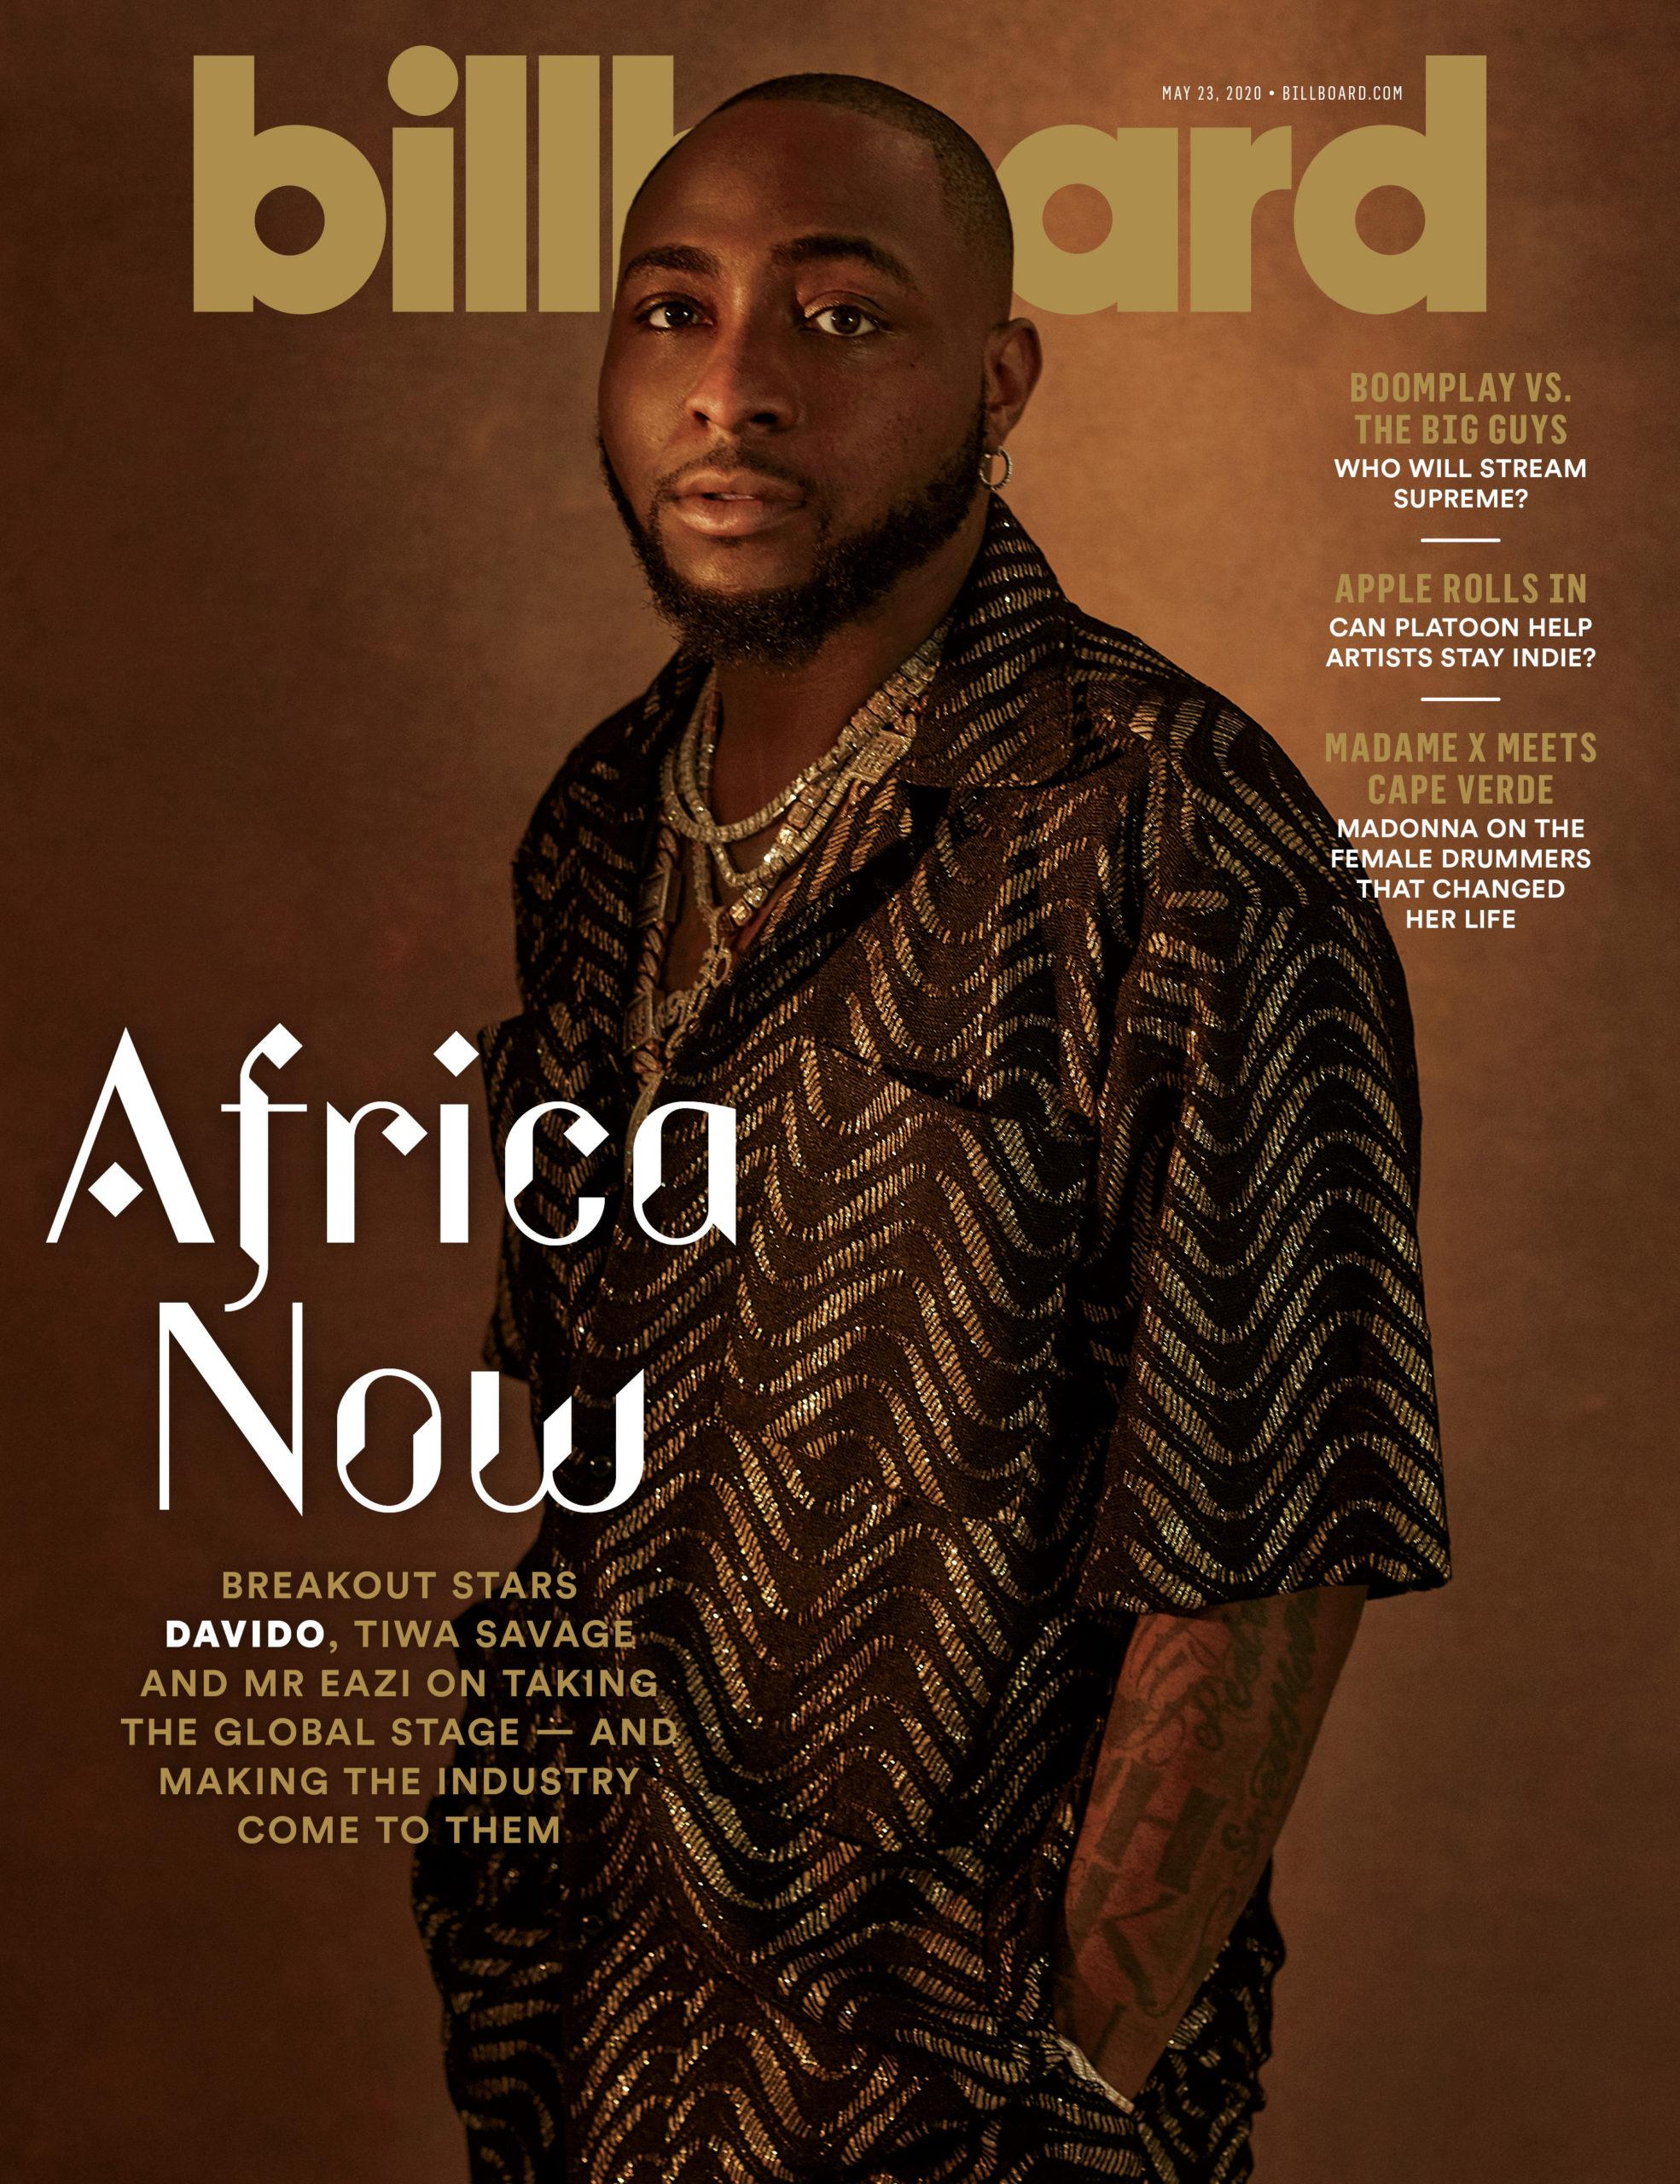 Davido, Tiwa Savage & Mr. Eazi Cover Latest Billboard Edition